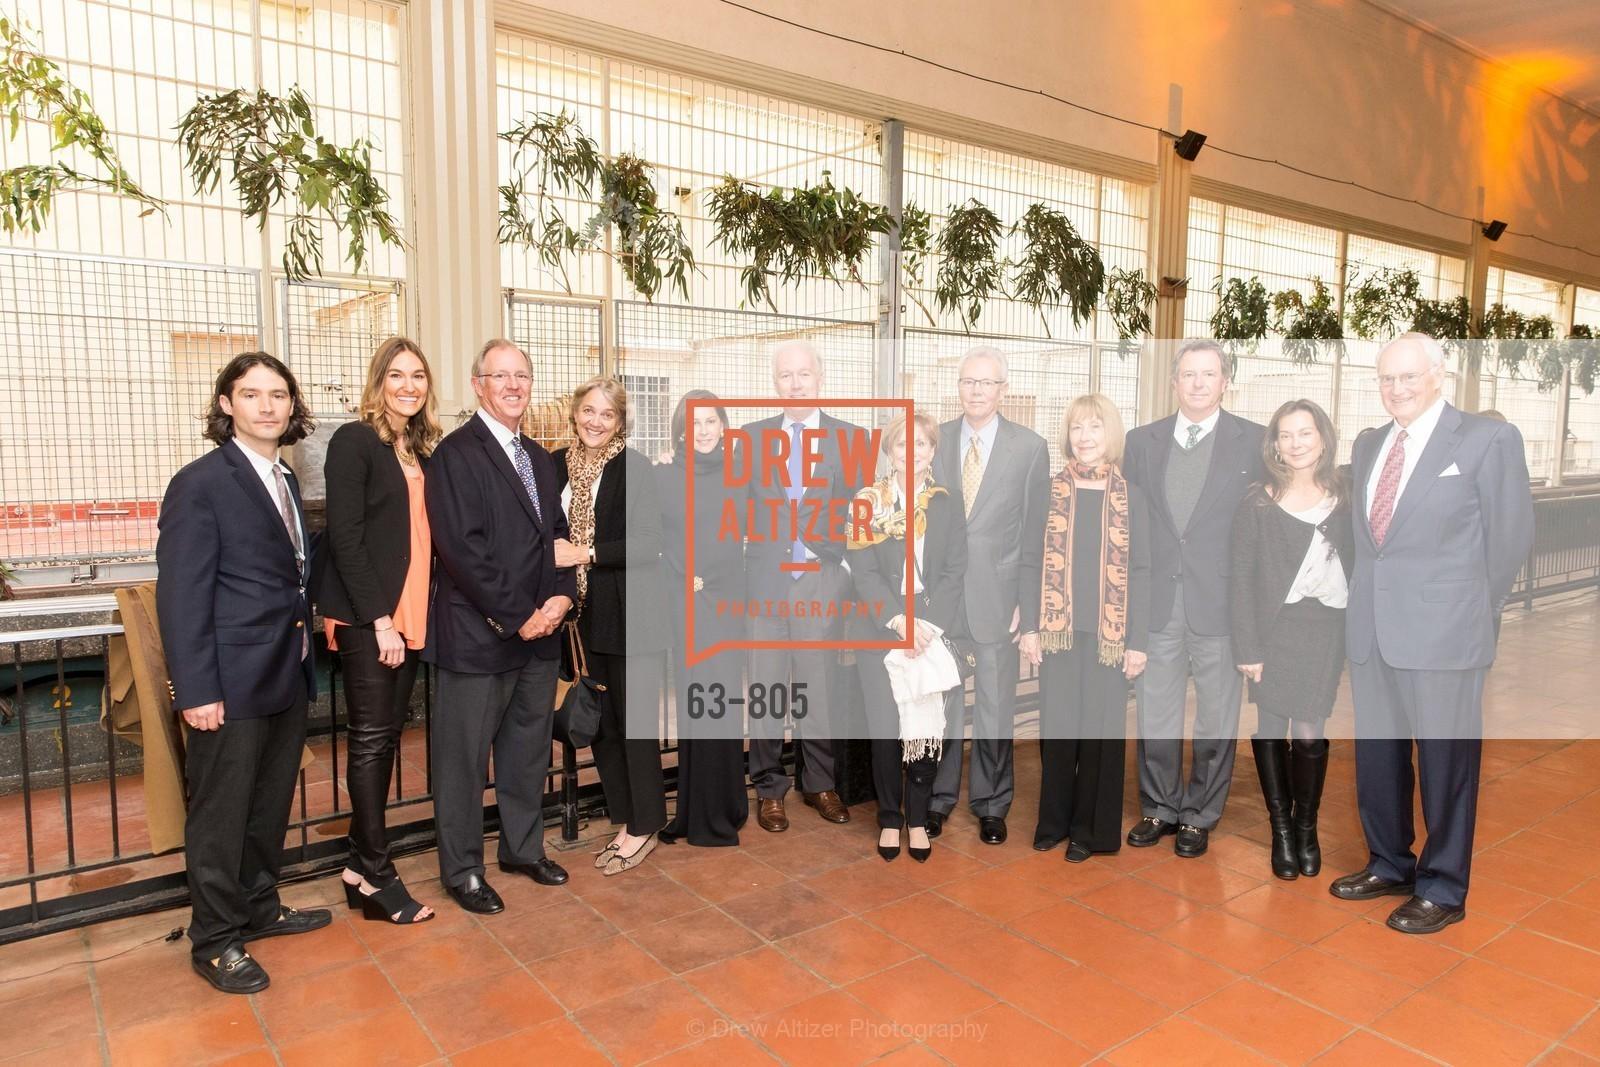 Tad Moore, Katharine Morris, Jamie Greene, Marritje Greene, Isabel Moore, Stephanie Keeney, Bob Keeney, Sandra Morris, John Stewart, Sue Stewart, George Morris, Photo #63-805